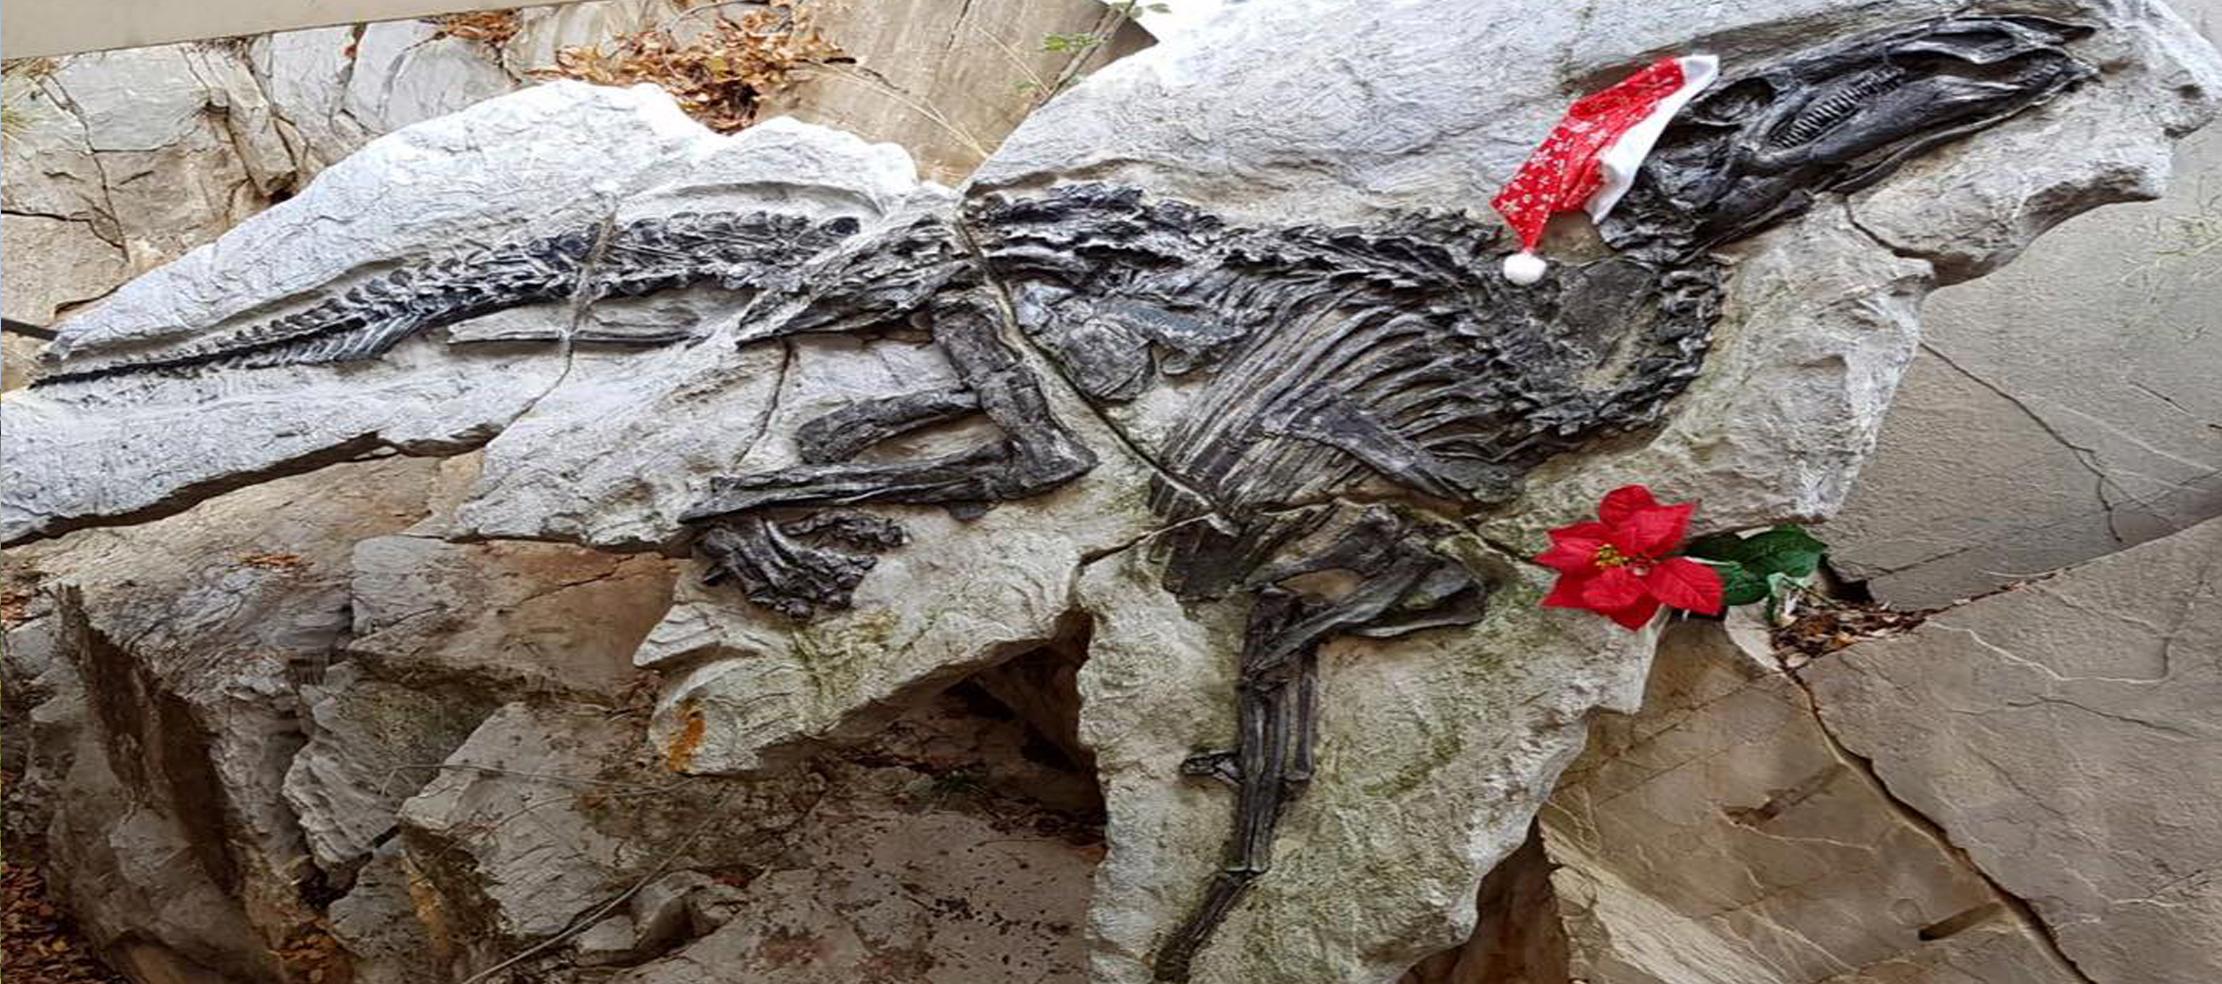 Antonio il dinosauro 19 12 16